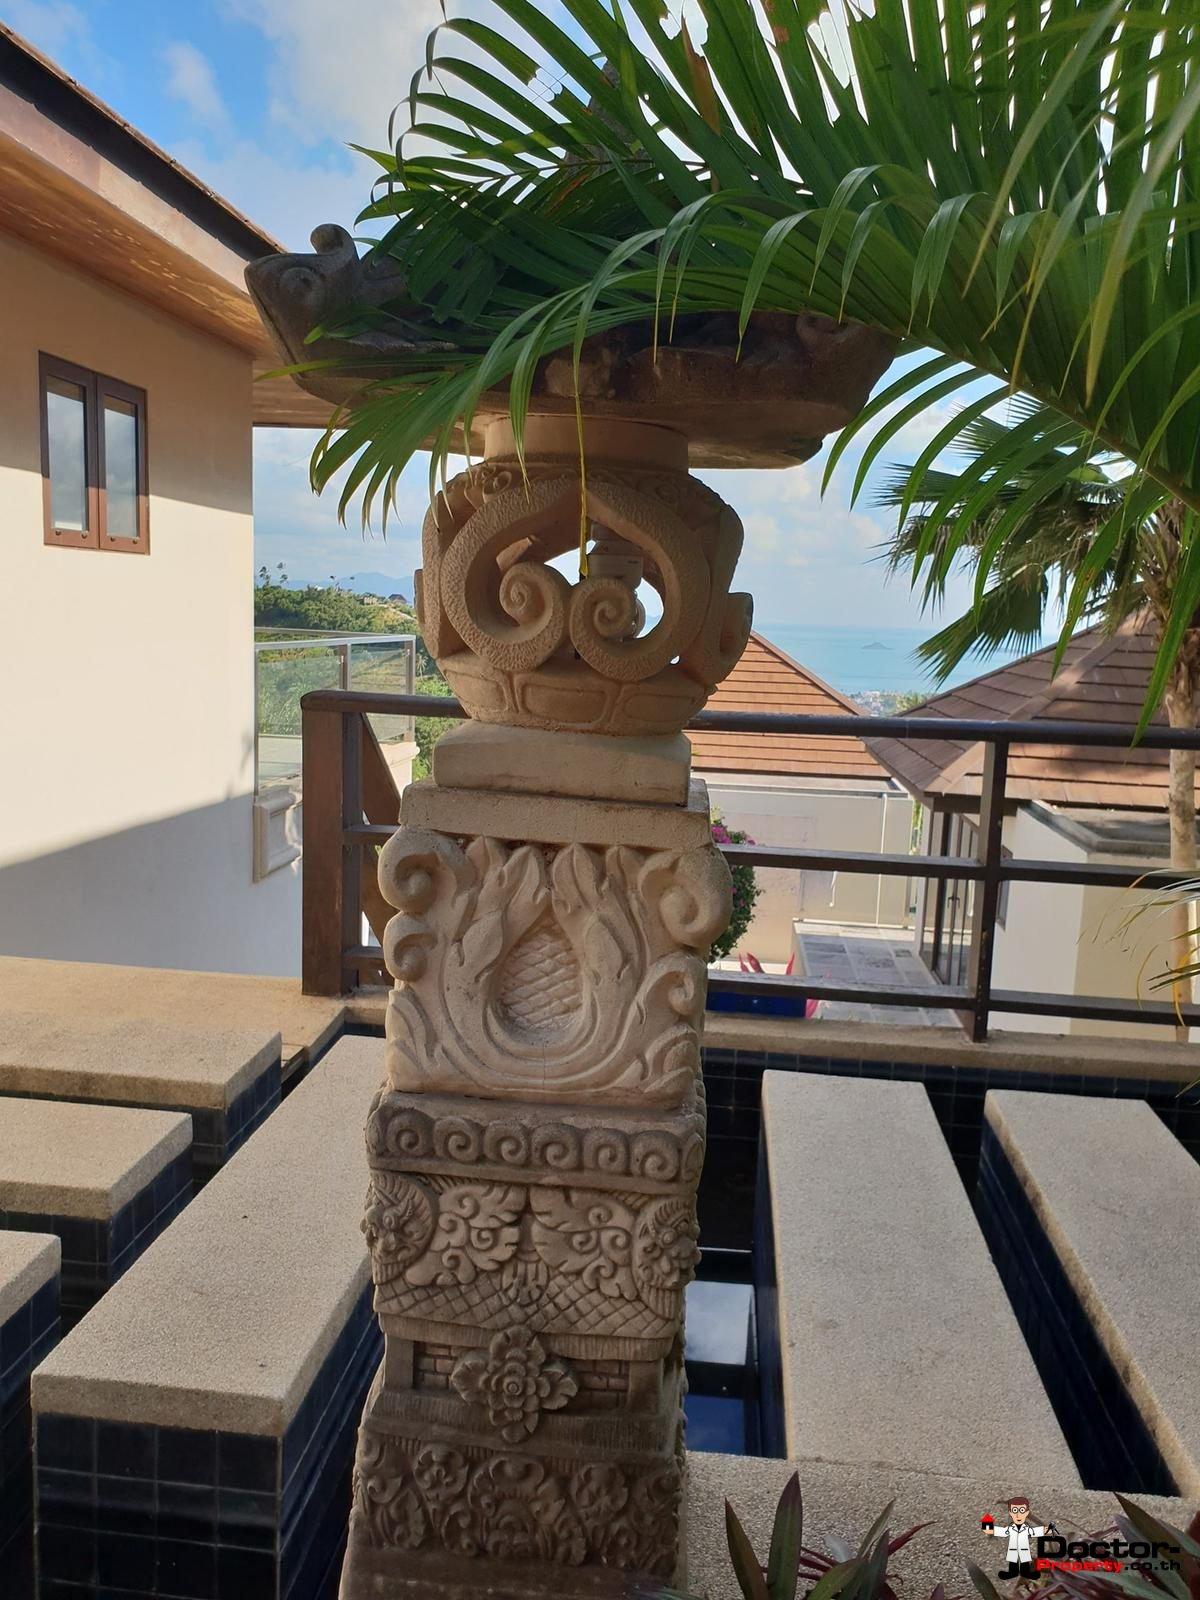 6 Bedroom Villa with Sea View - Bophut - Koh Samui - for sale 13